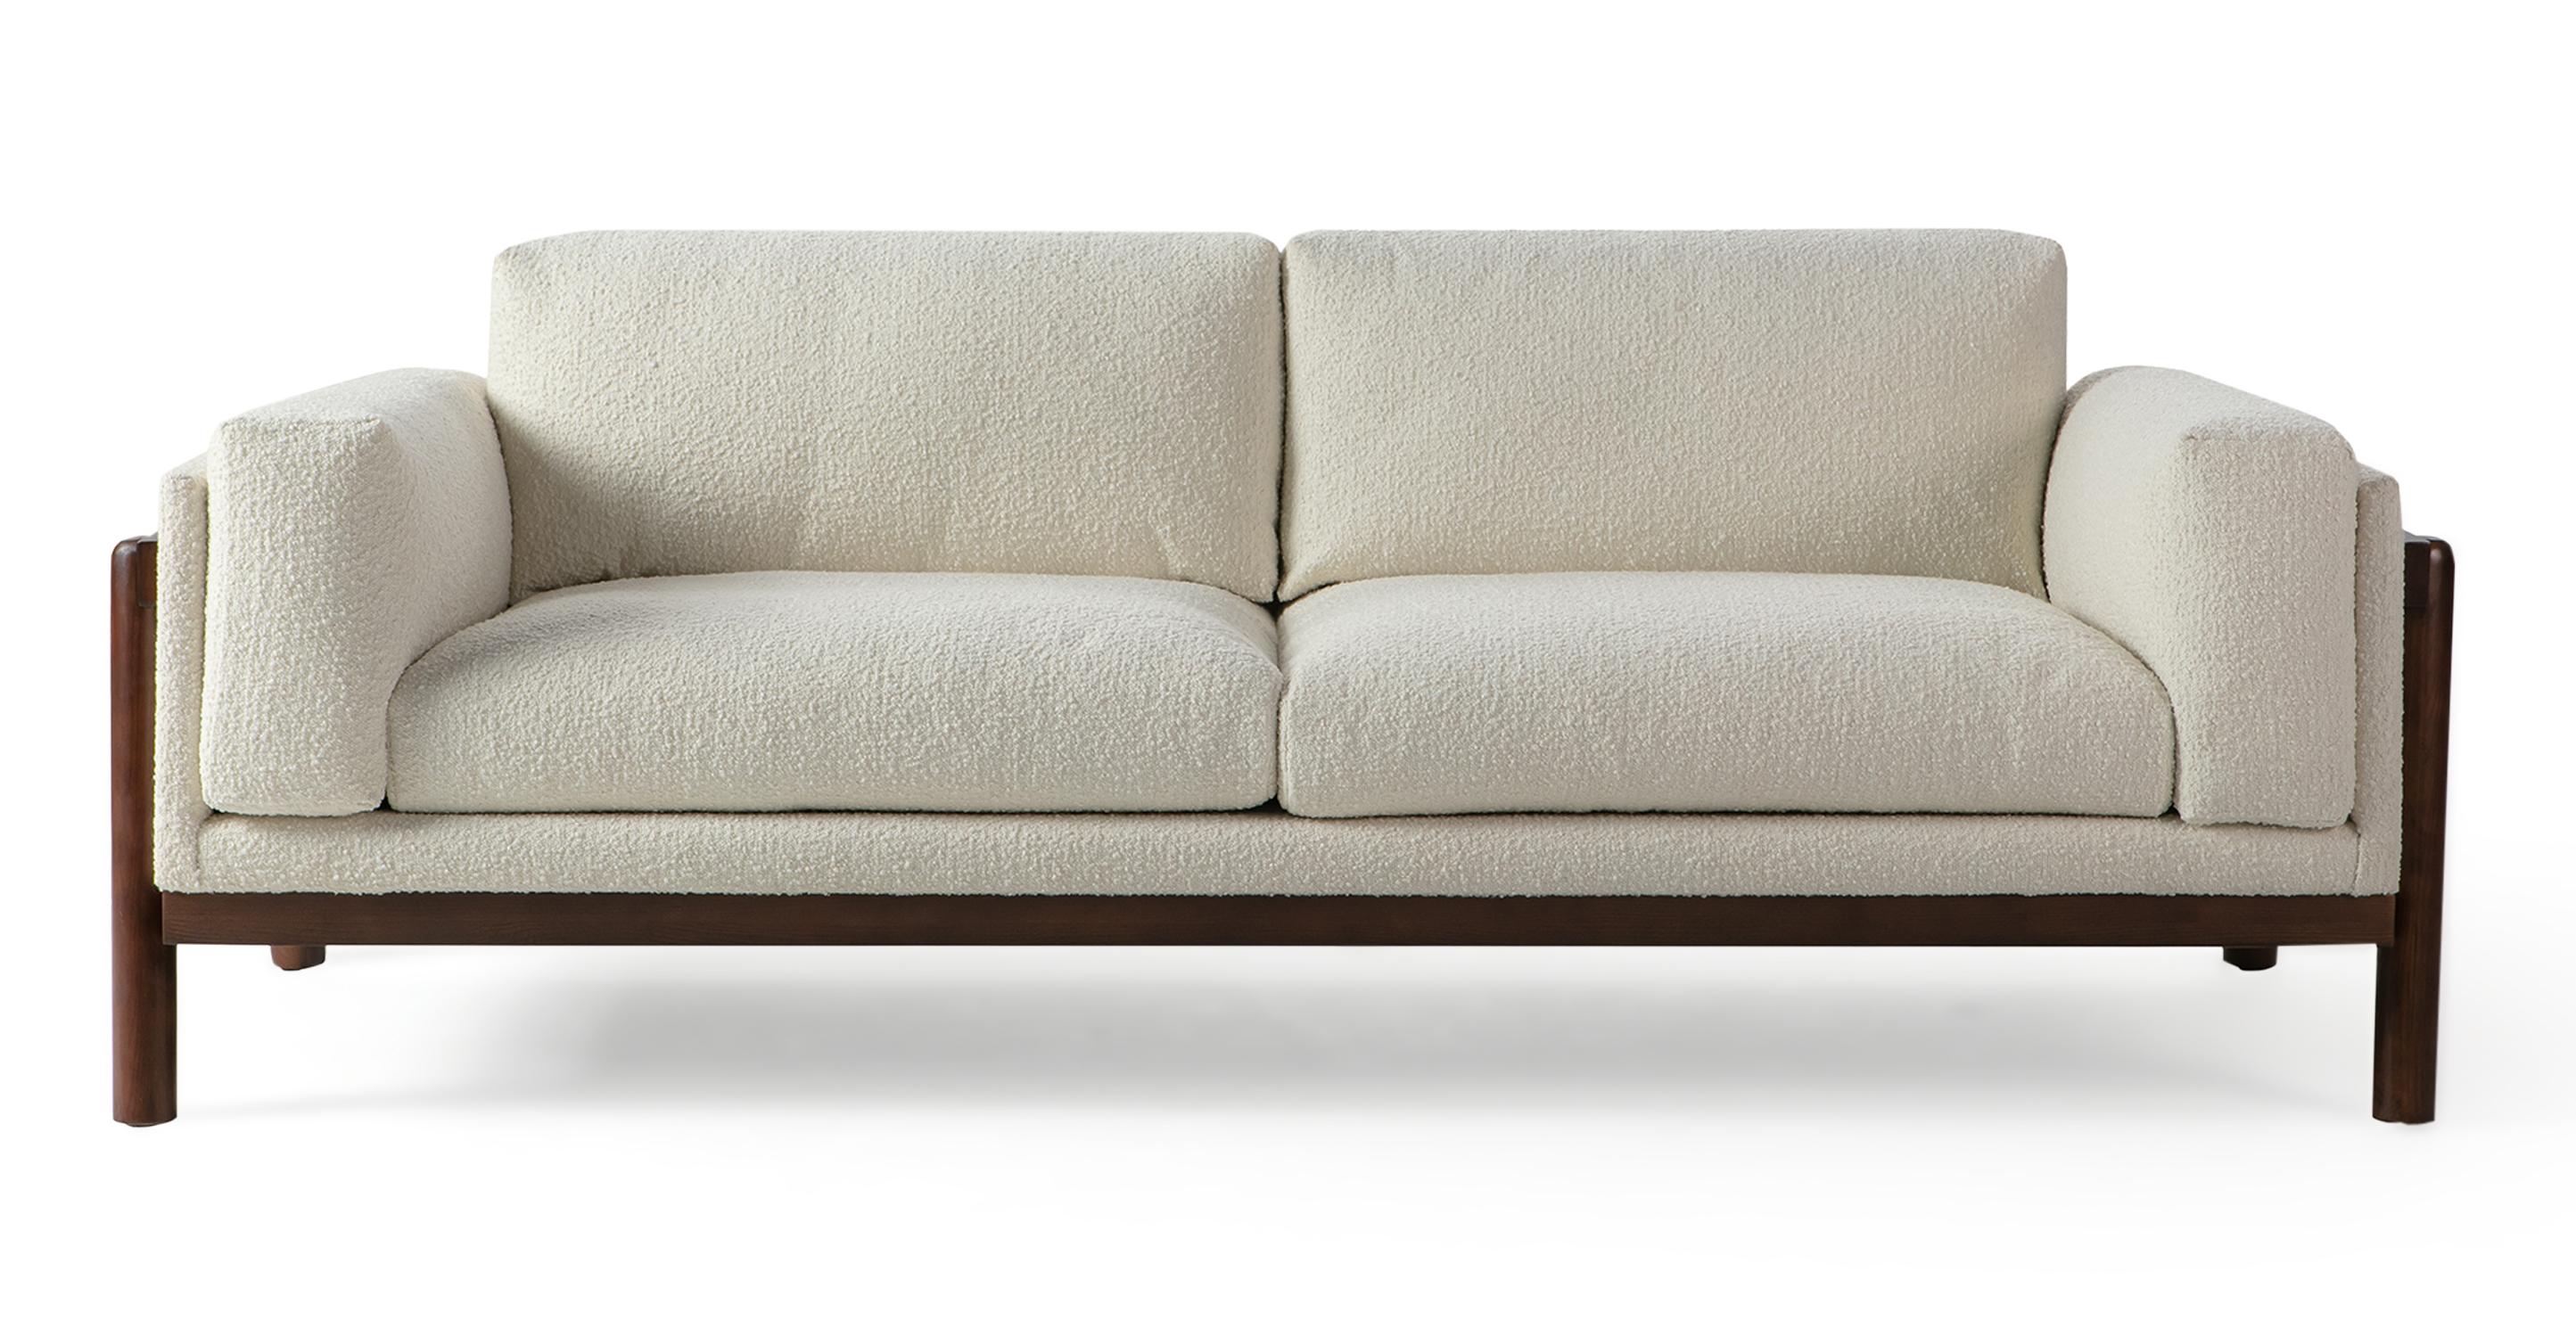 "Nordic 82"" Fabric Sofa, Cream Boucle"